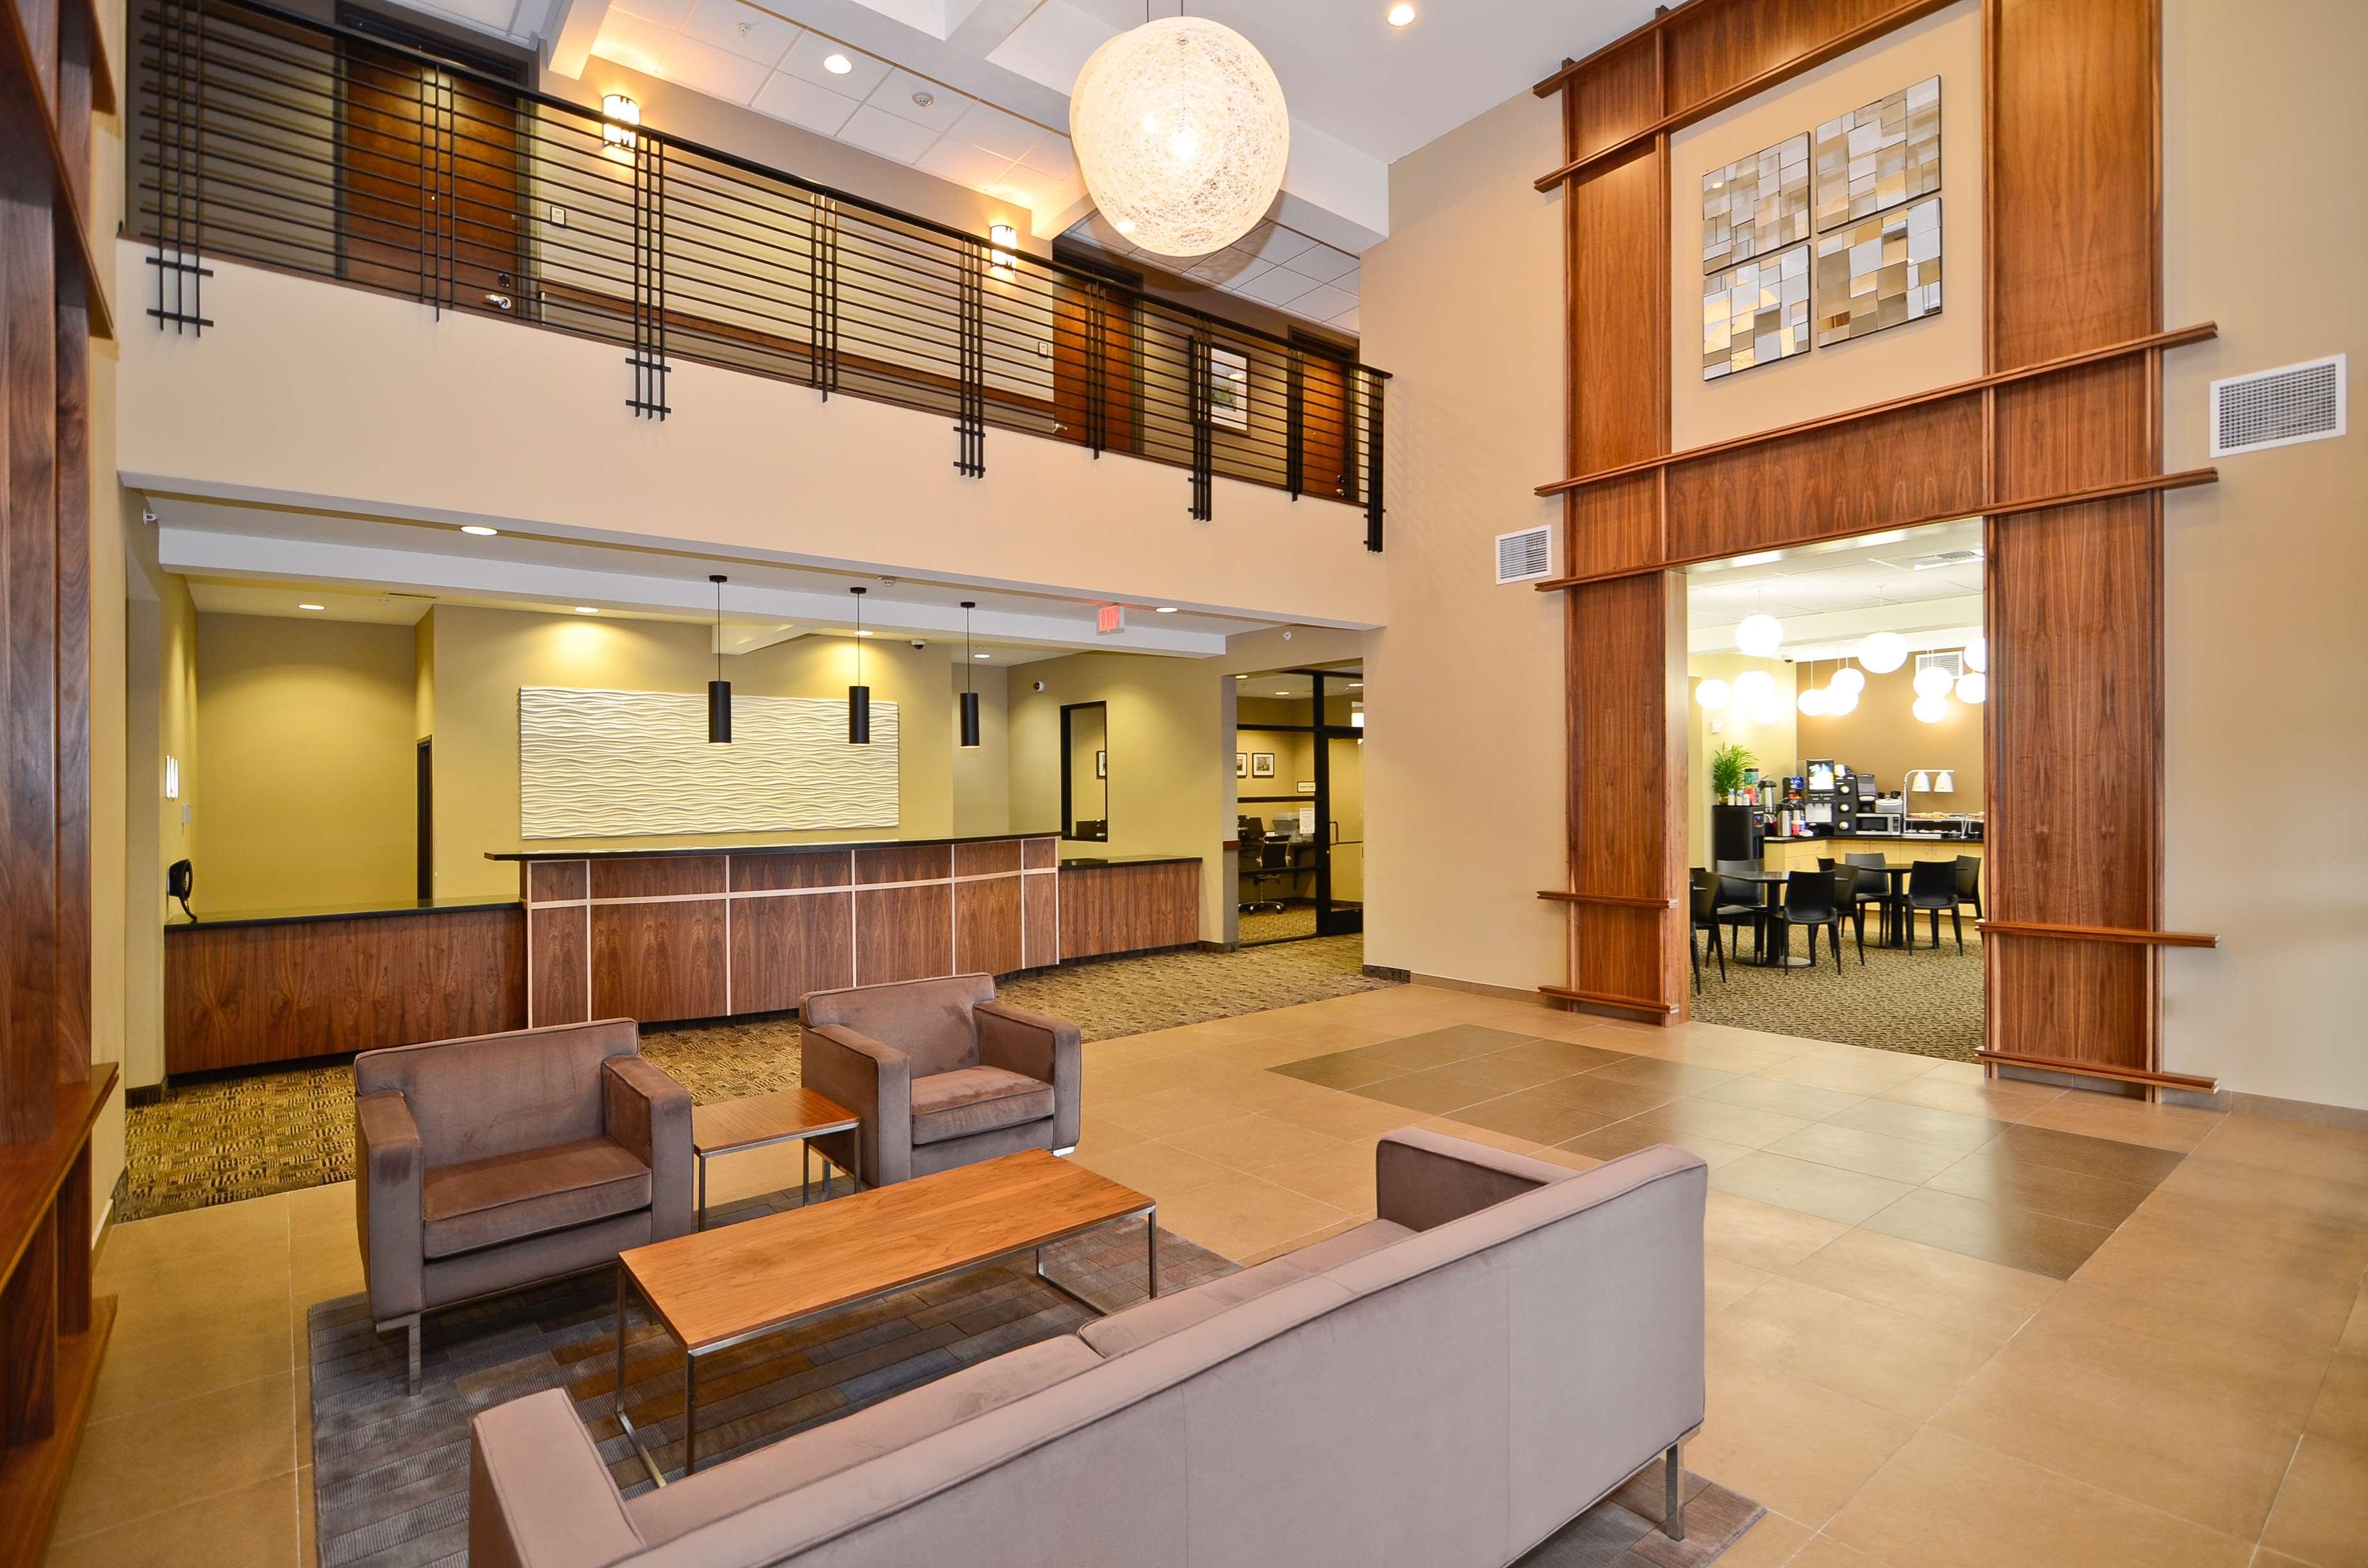 Best Western Plus Lacey Inn & Suites image 14